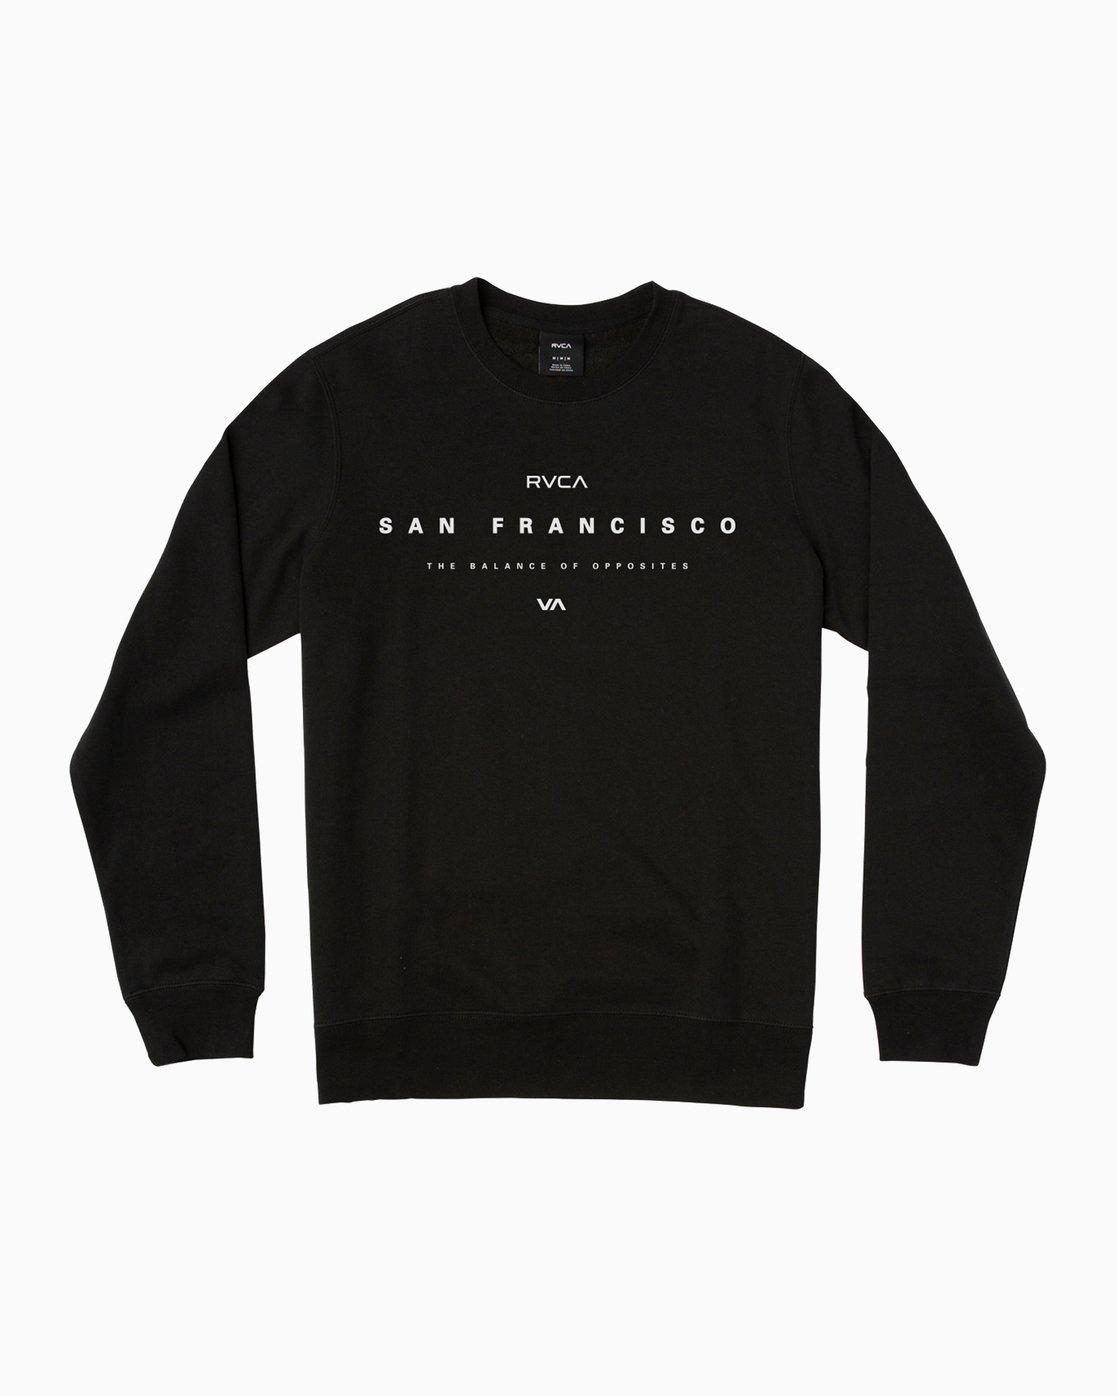 0 San Francisco VA Crew Sweatshirt Black M622SRSV RVCA